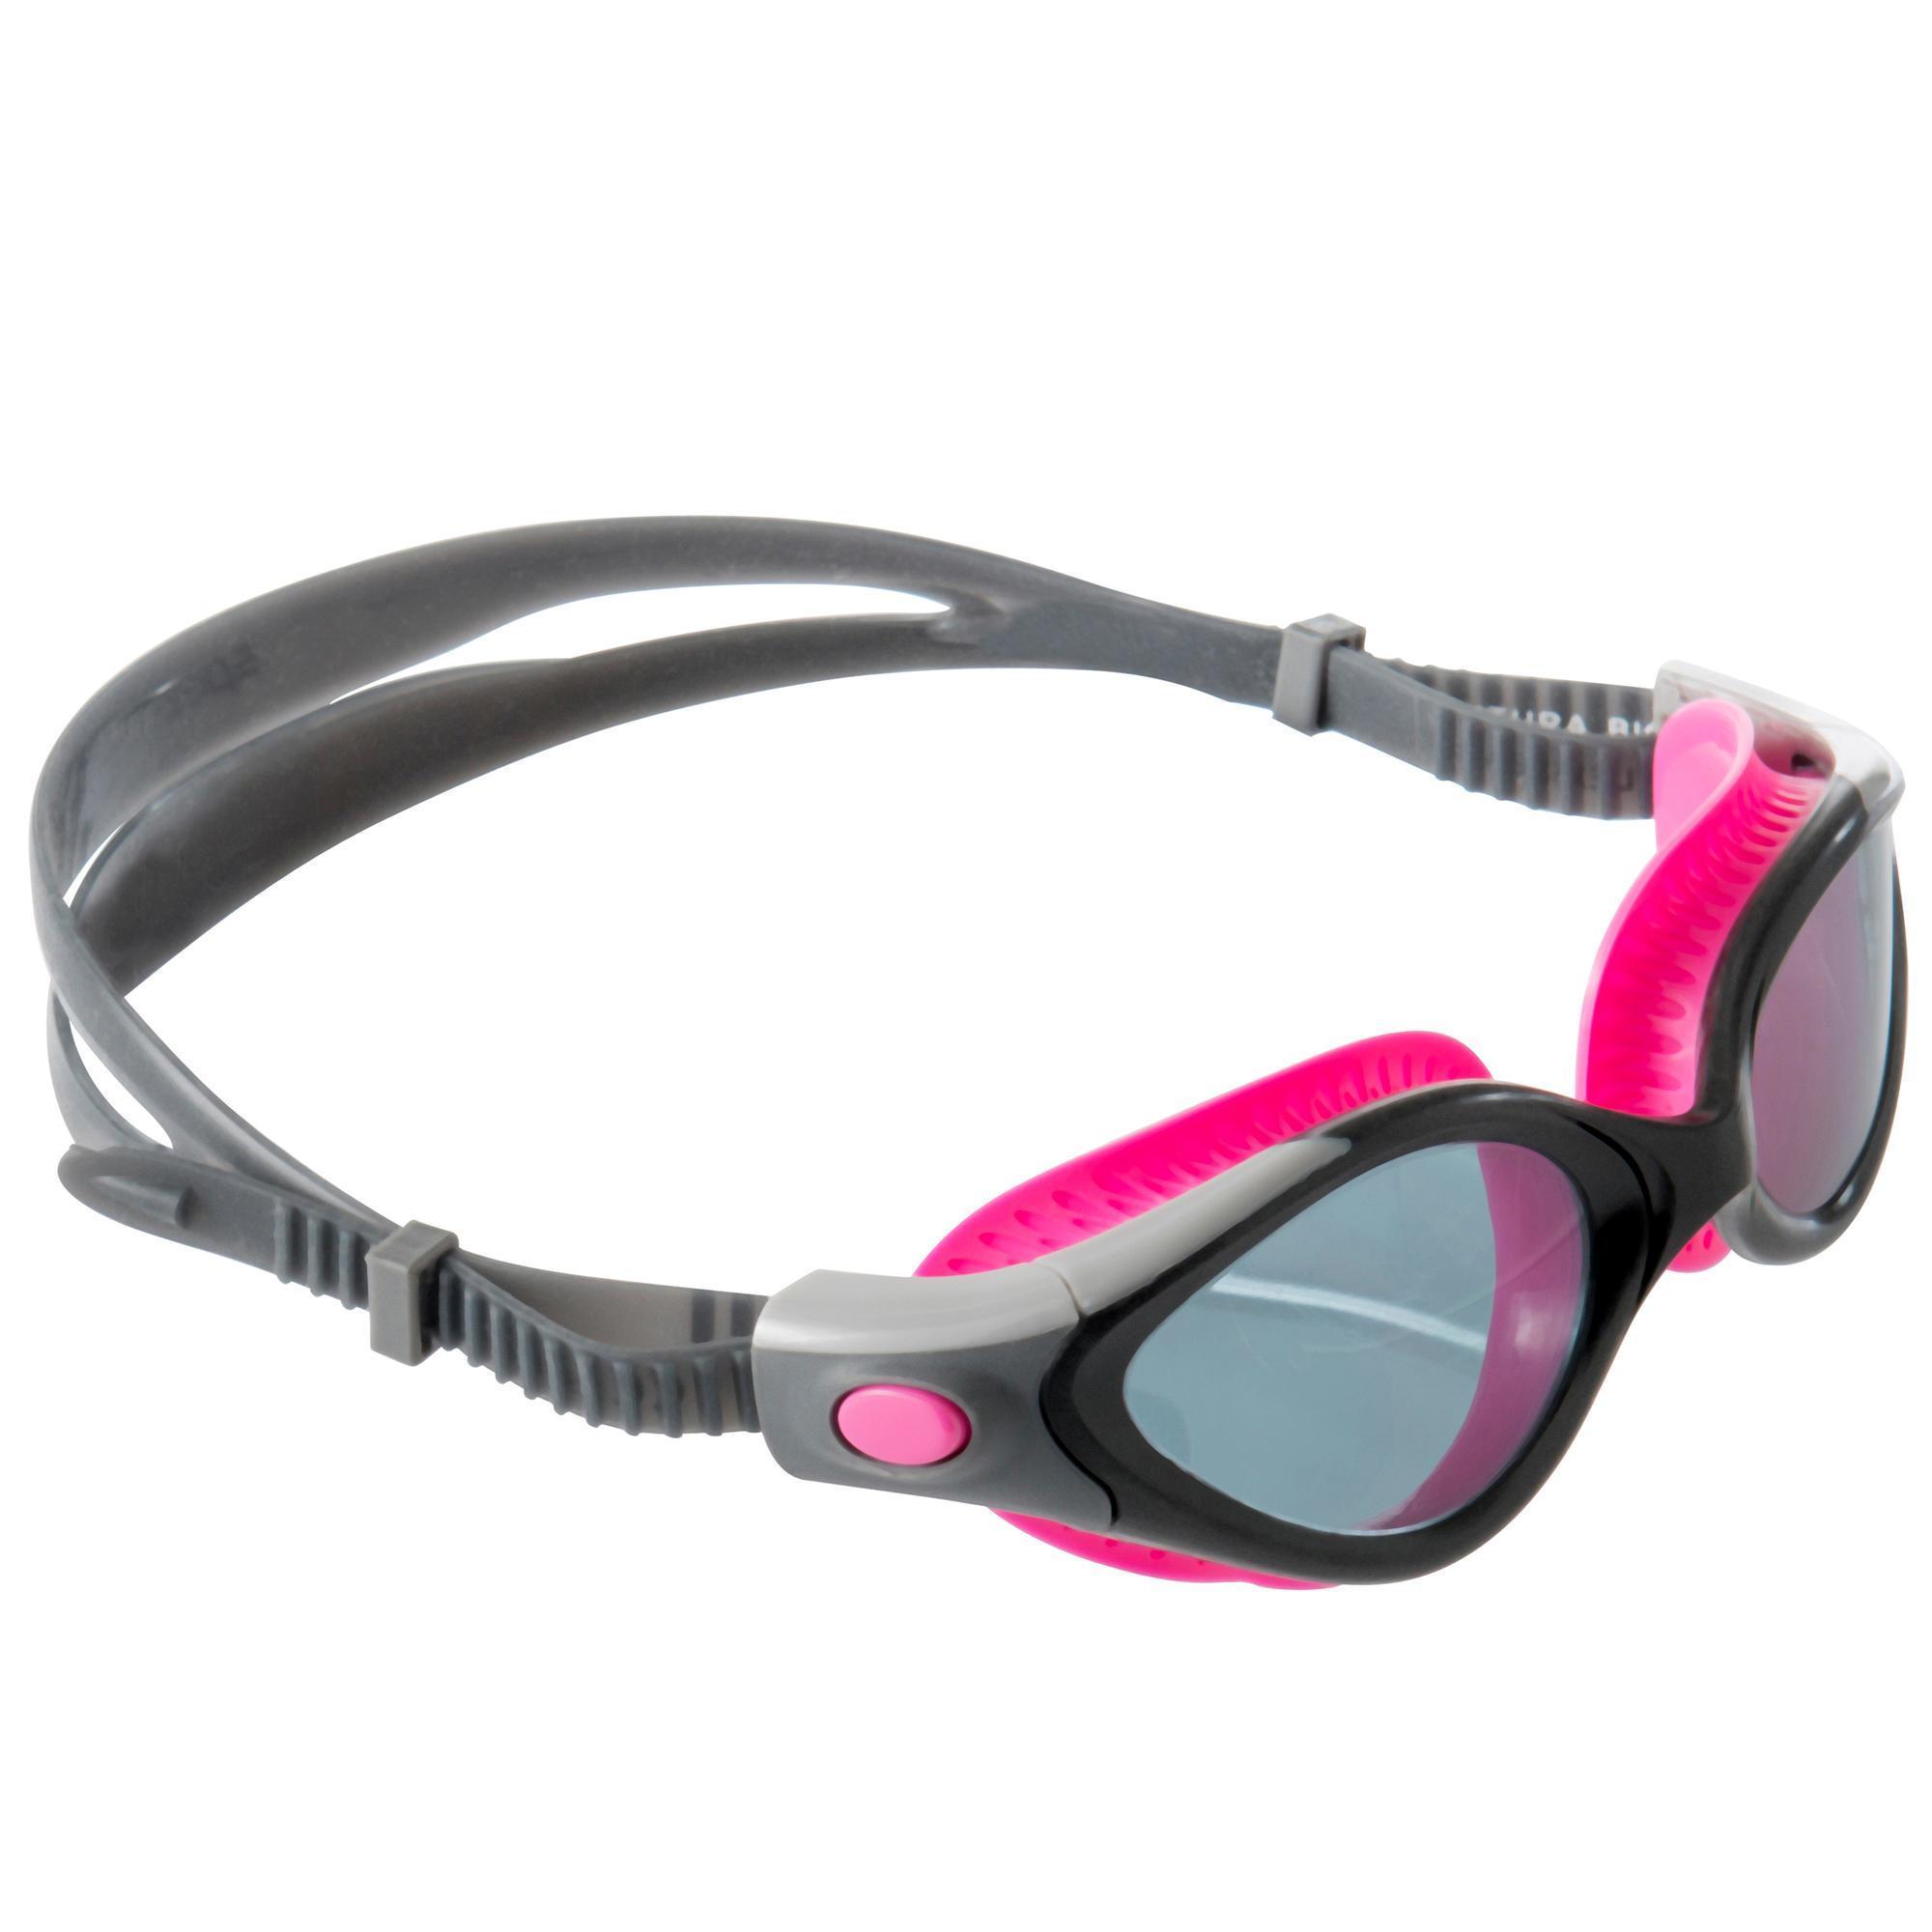 318fa49890e1f9 Image of Speedo Zwembril Futura Biofuse Flexiseal dames roze unieke grootte  2416526